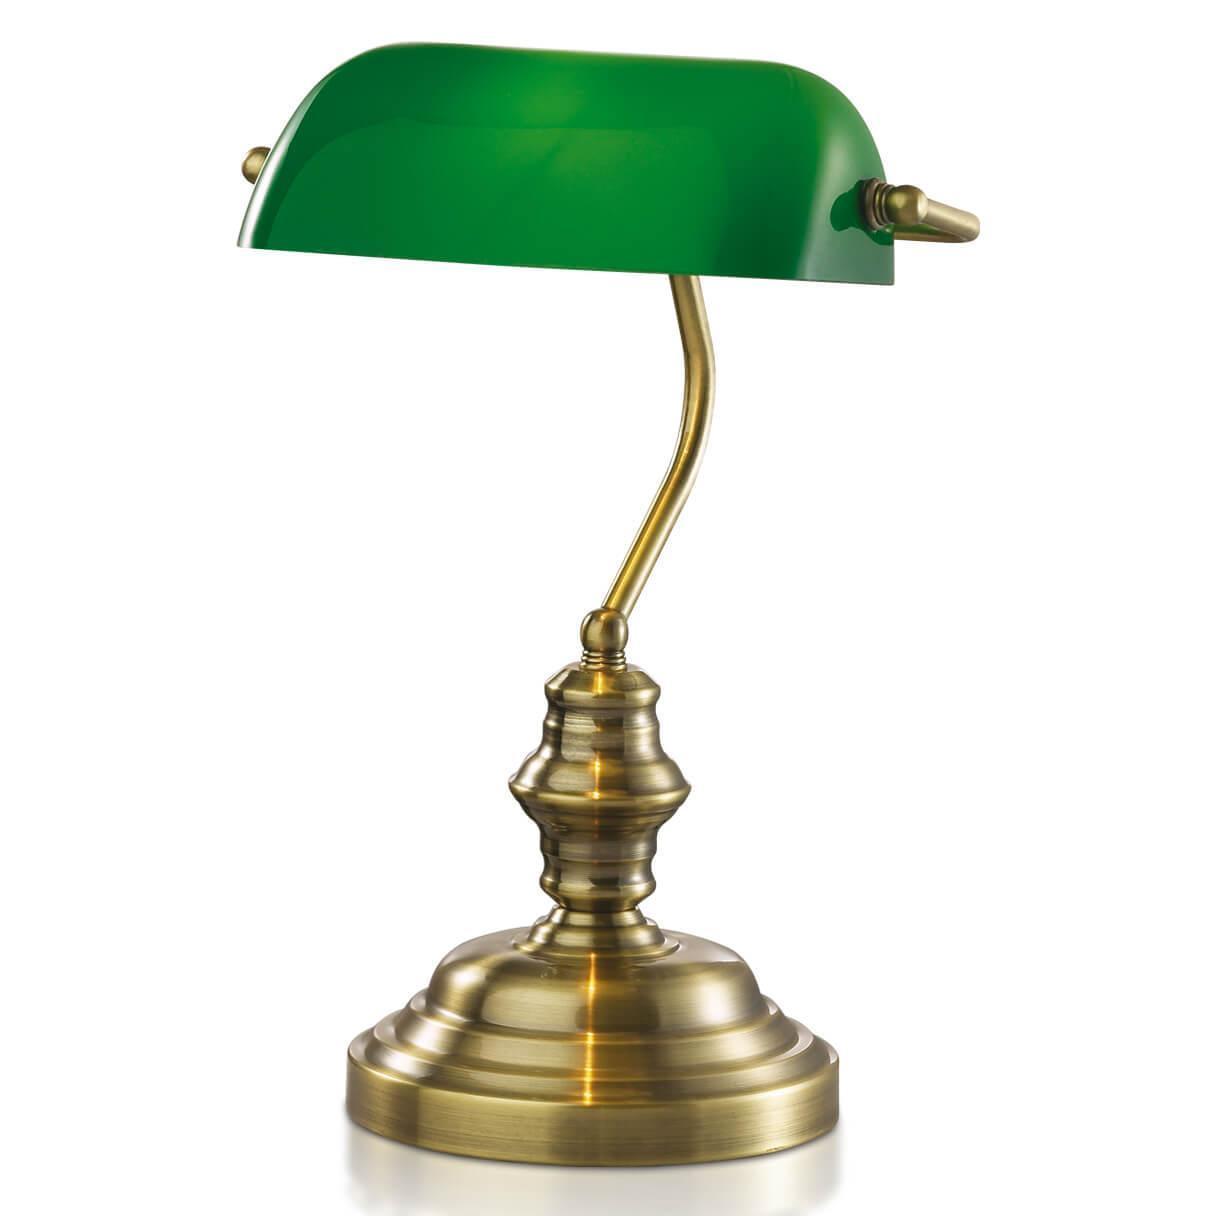 Настольный светильник Odeon Light 2224/1T, E27, 60 Вт настольная лампа odeon light tres 2224 1t